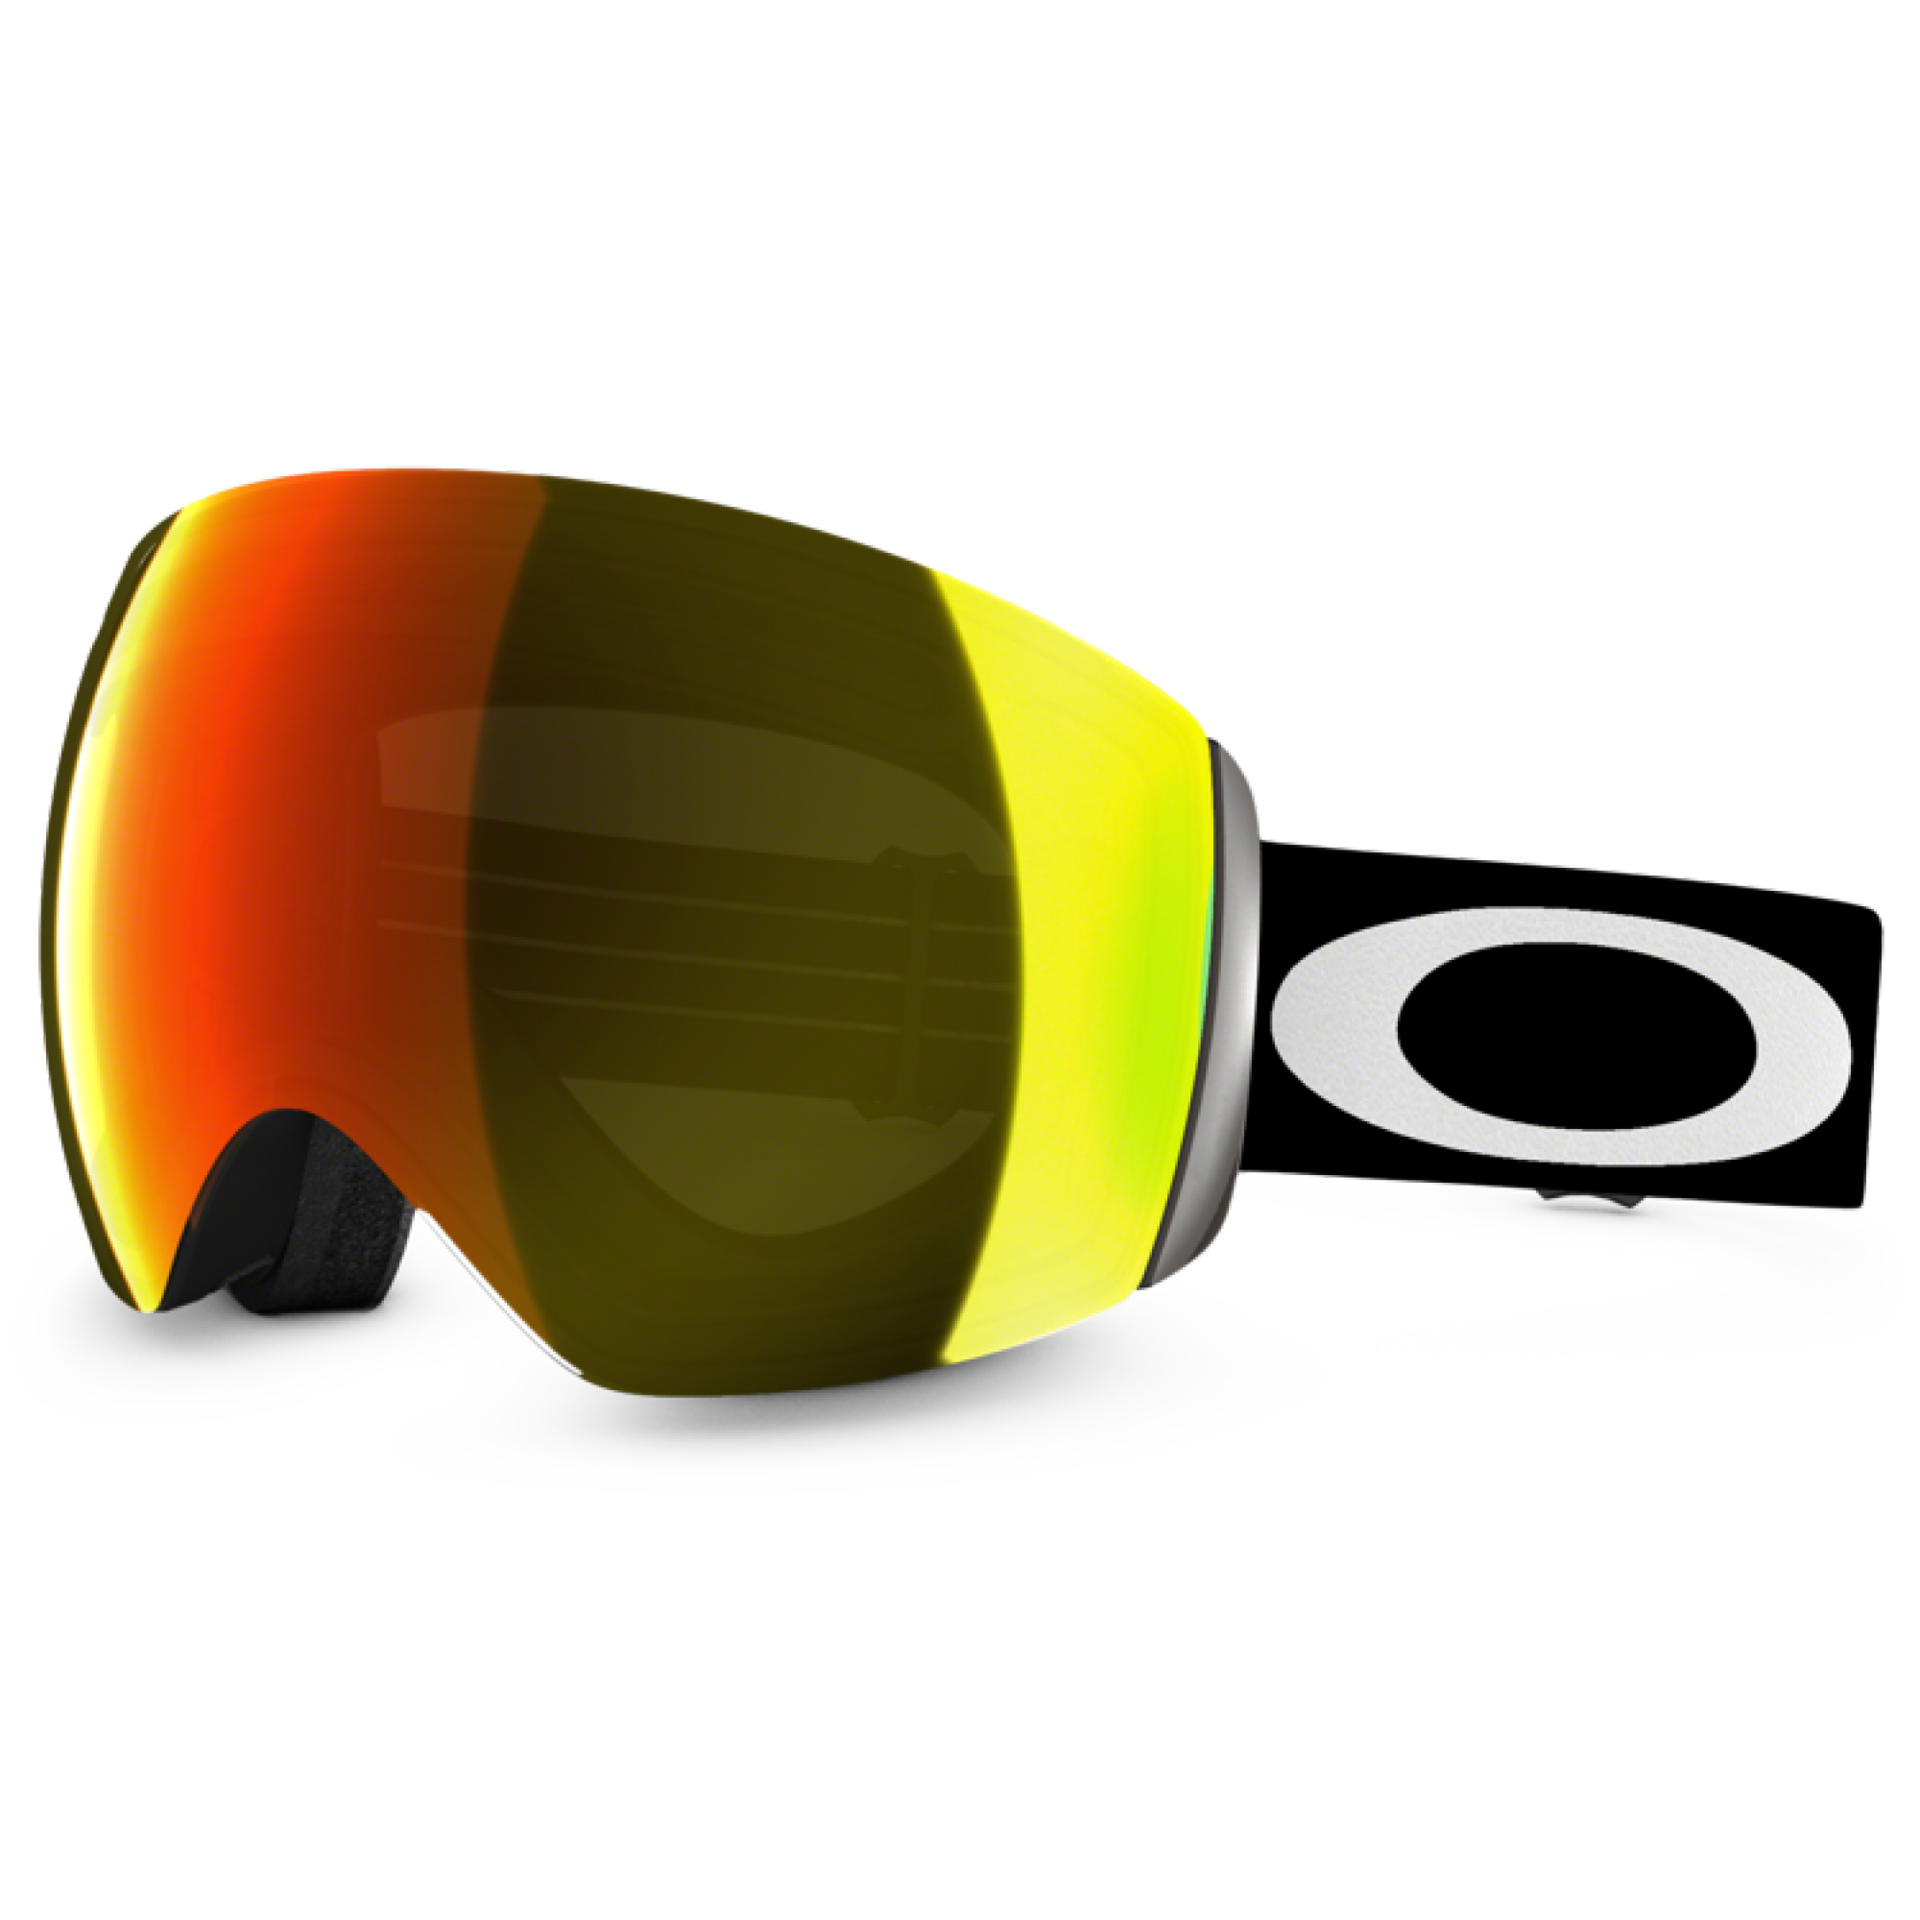 GOGLE OAKLEY FLIGHT DECK MATT BLACK|FIRE IRIDIUM 1